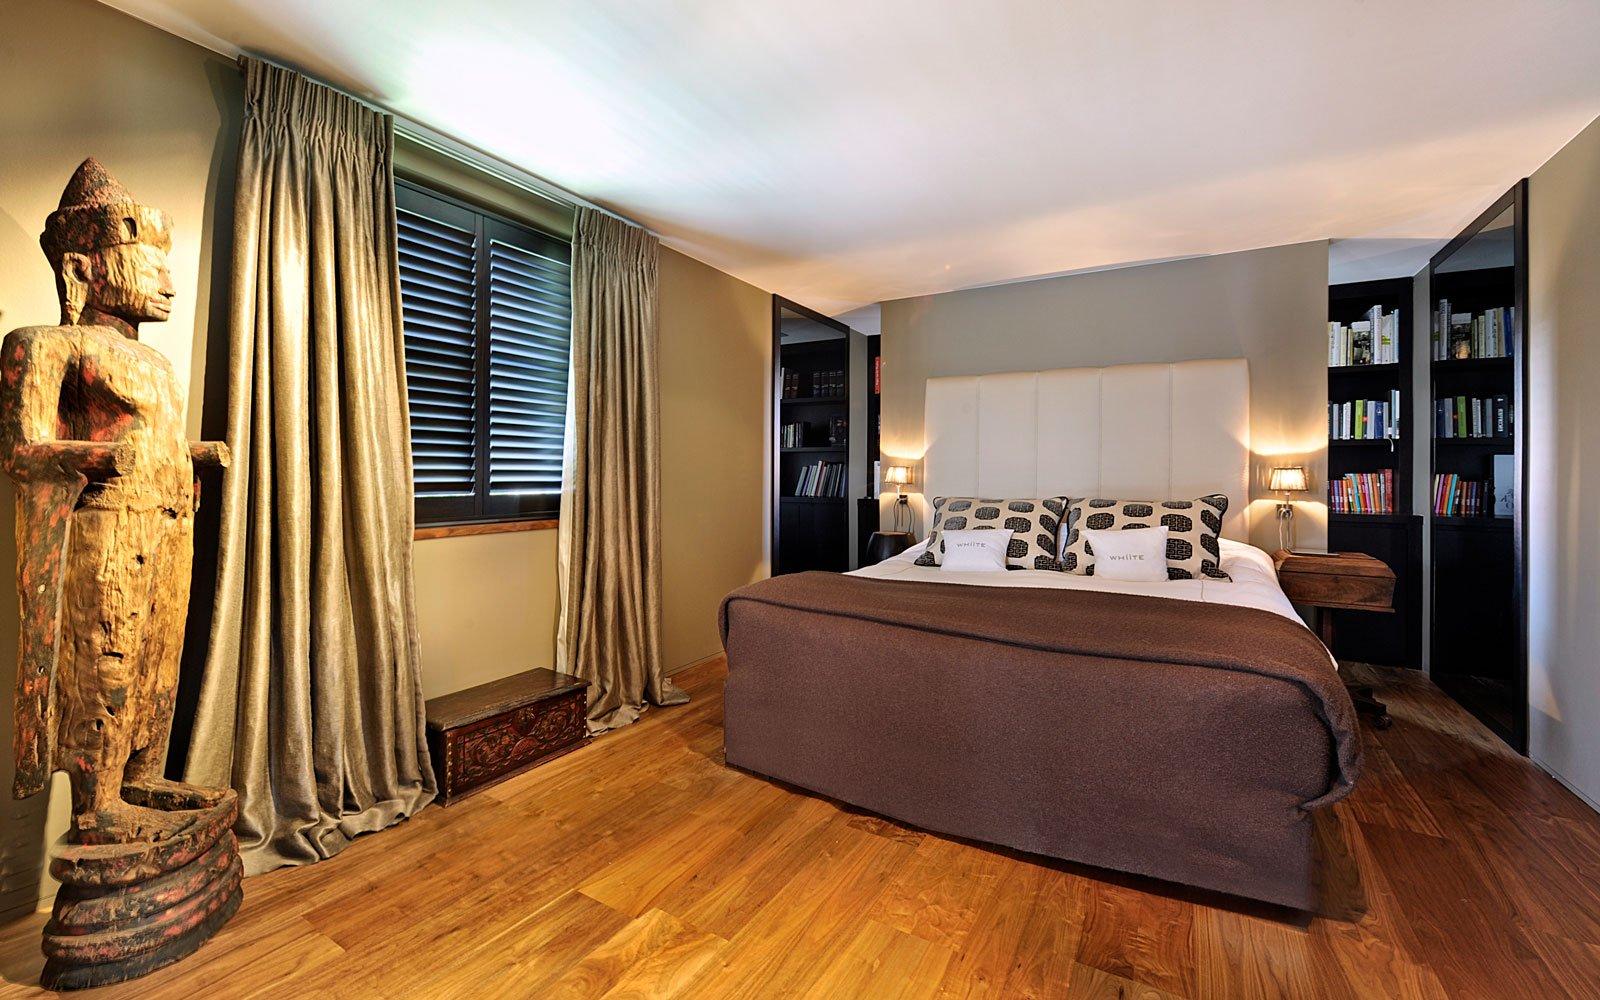 Slaapkamer, master bedroom, bed, houten vloer, klassieke villa, Bart François